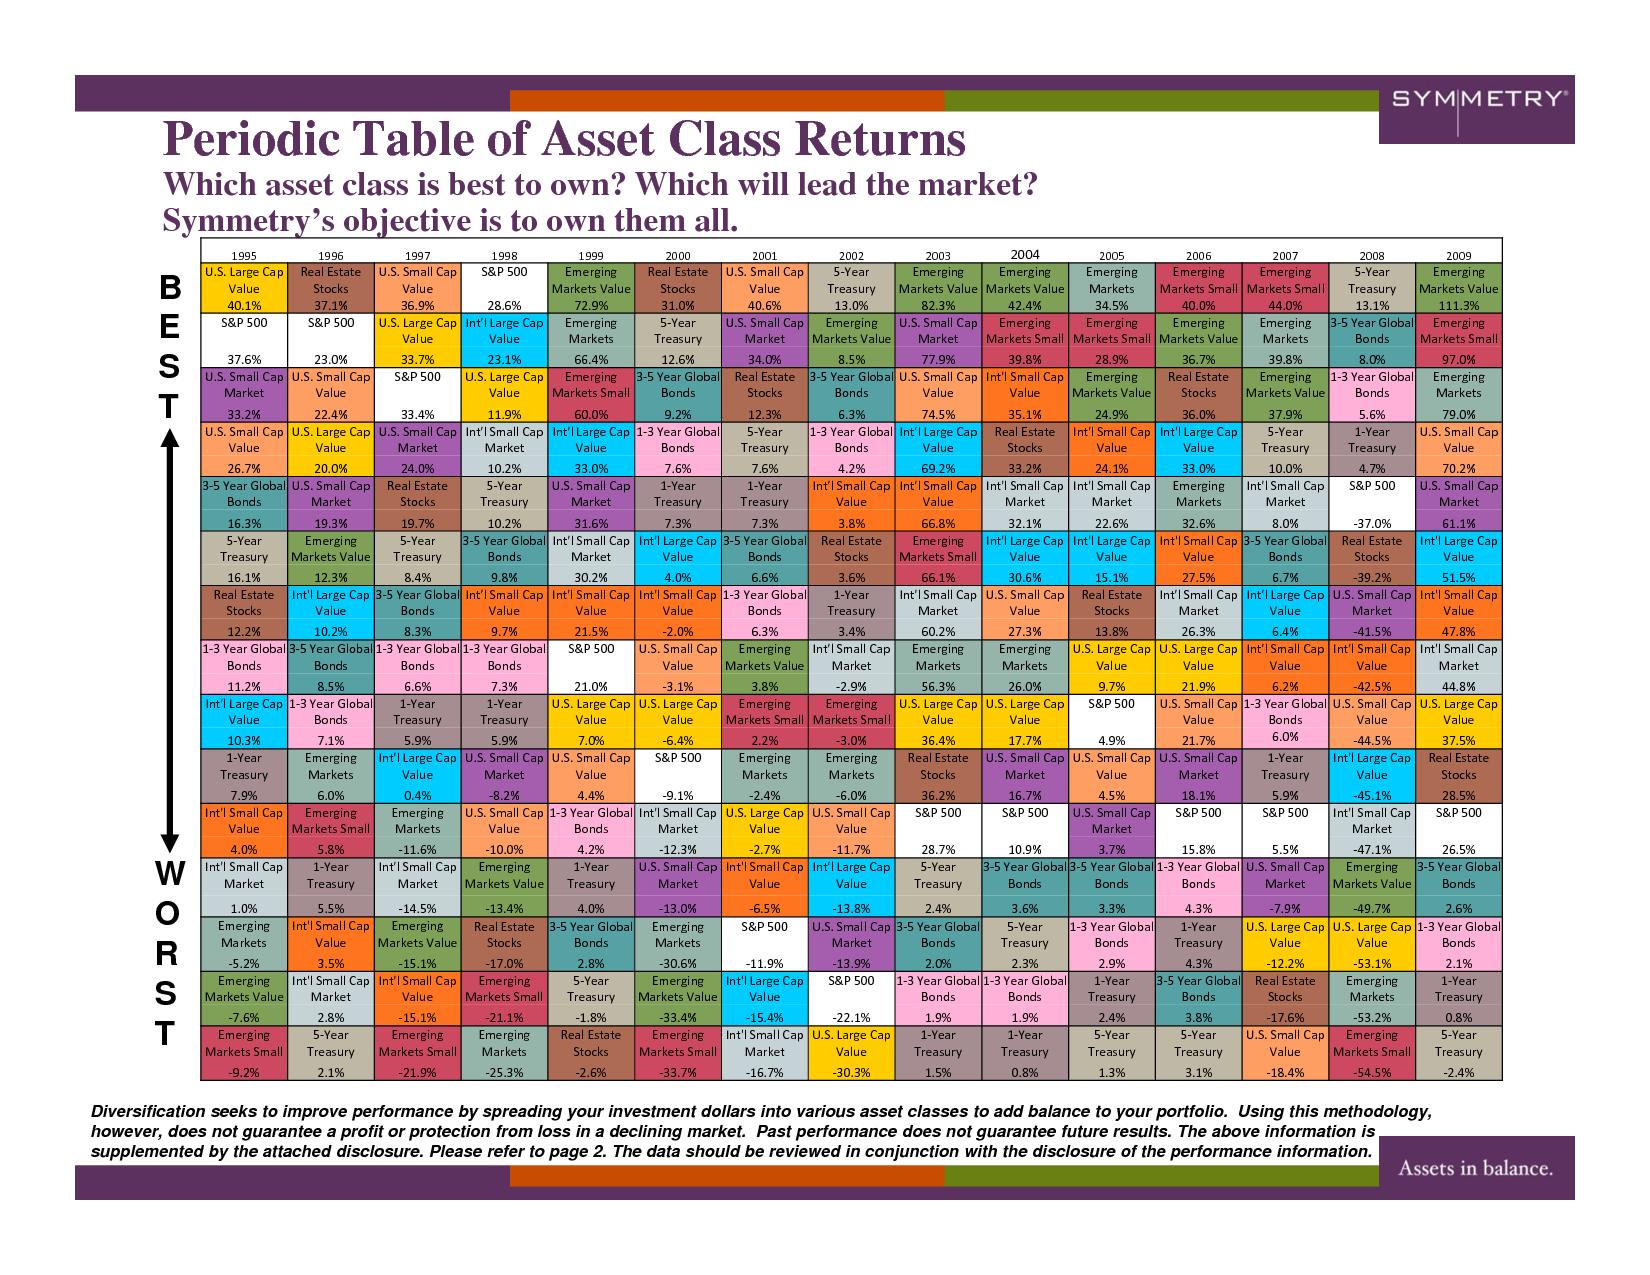 Periodic table of asset class returns asset return pinterest periodic table of asset class returns urtaz Gallery